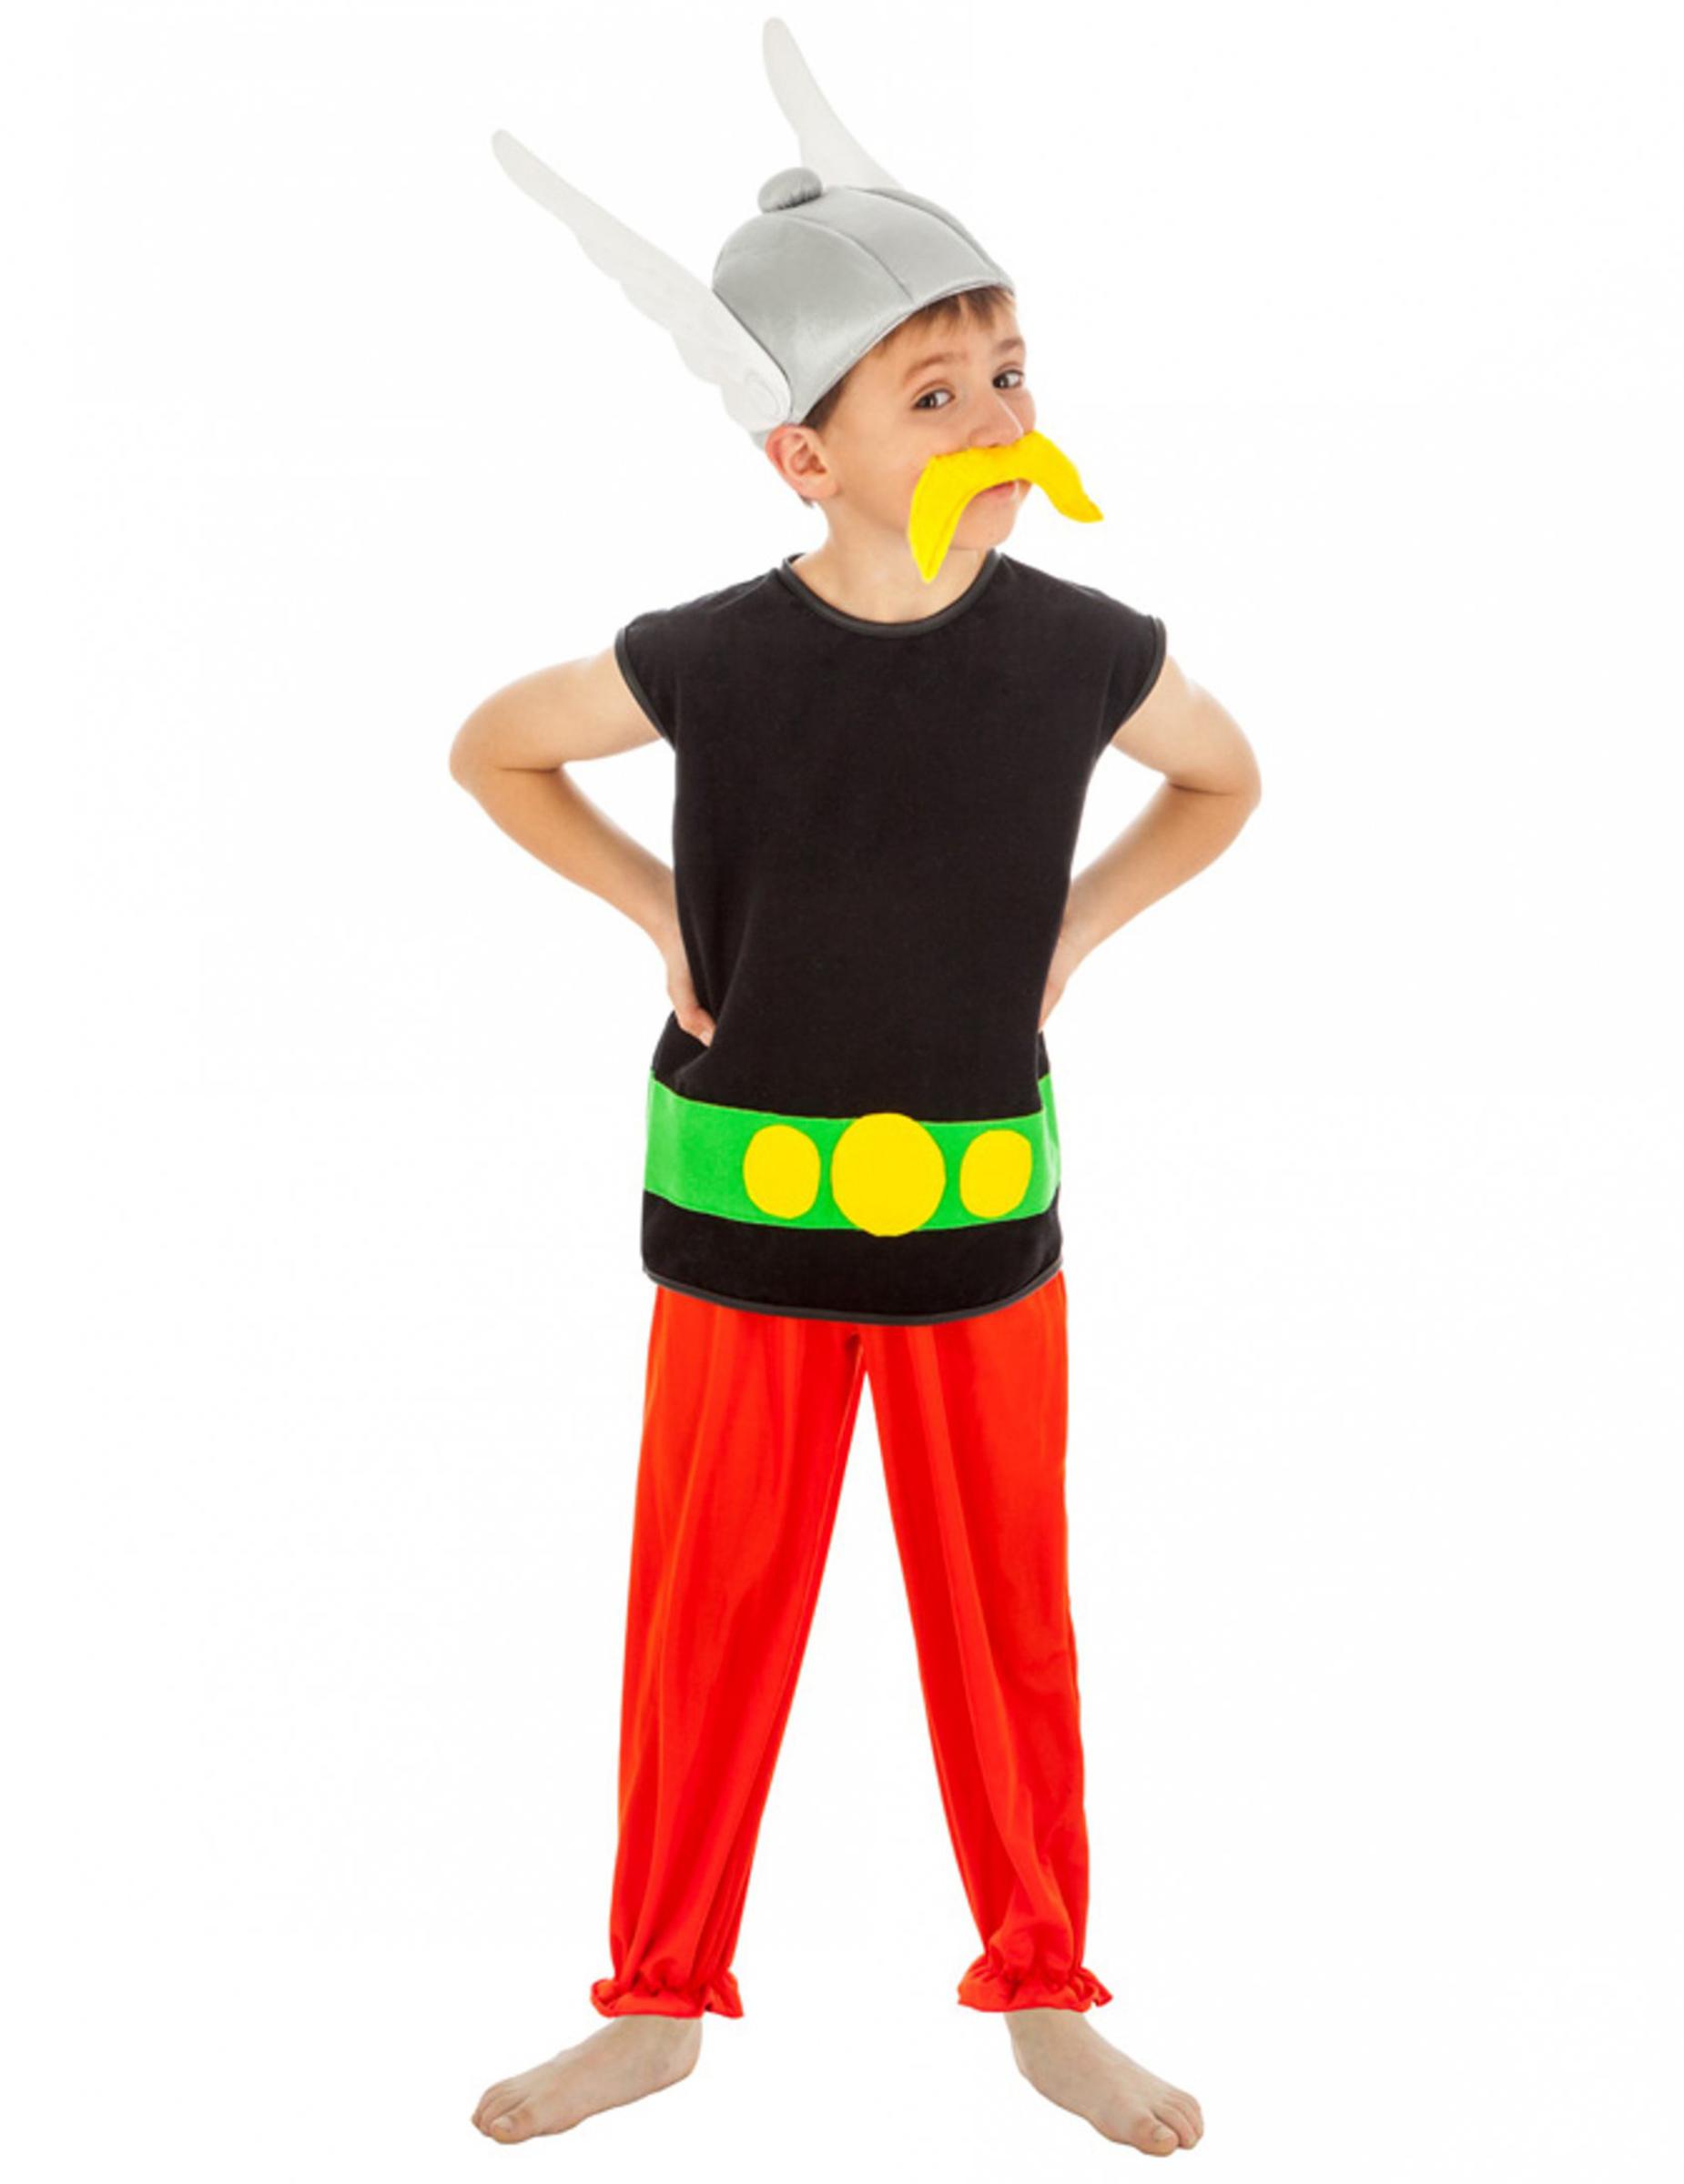 Déguisement Homme Petit GAULOIS XL Adulte Asterix Dessin Animé Film Obélix NEUF